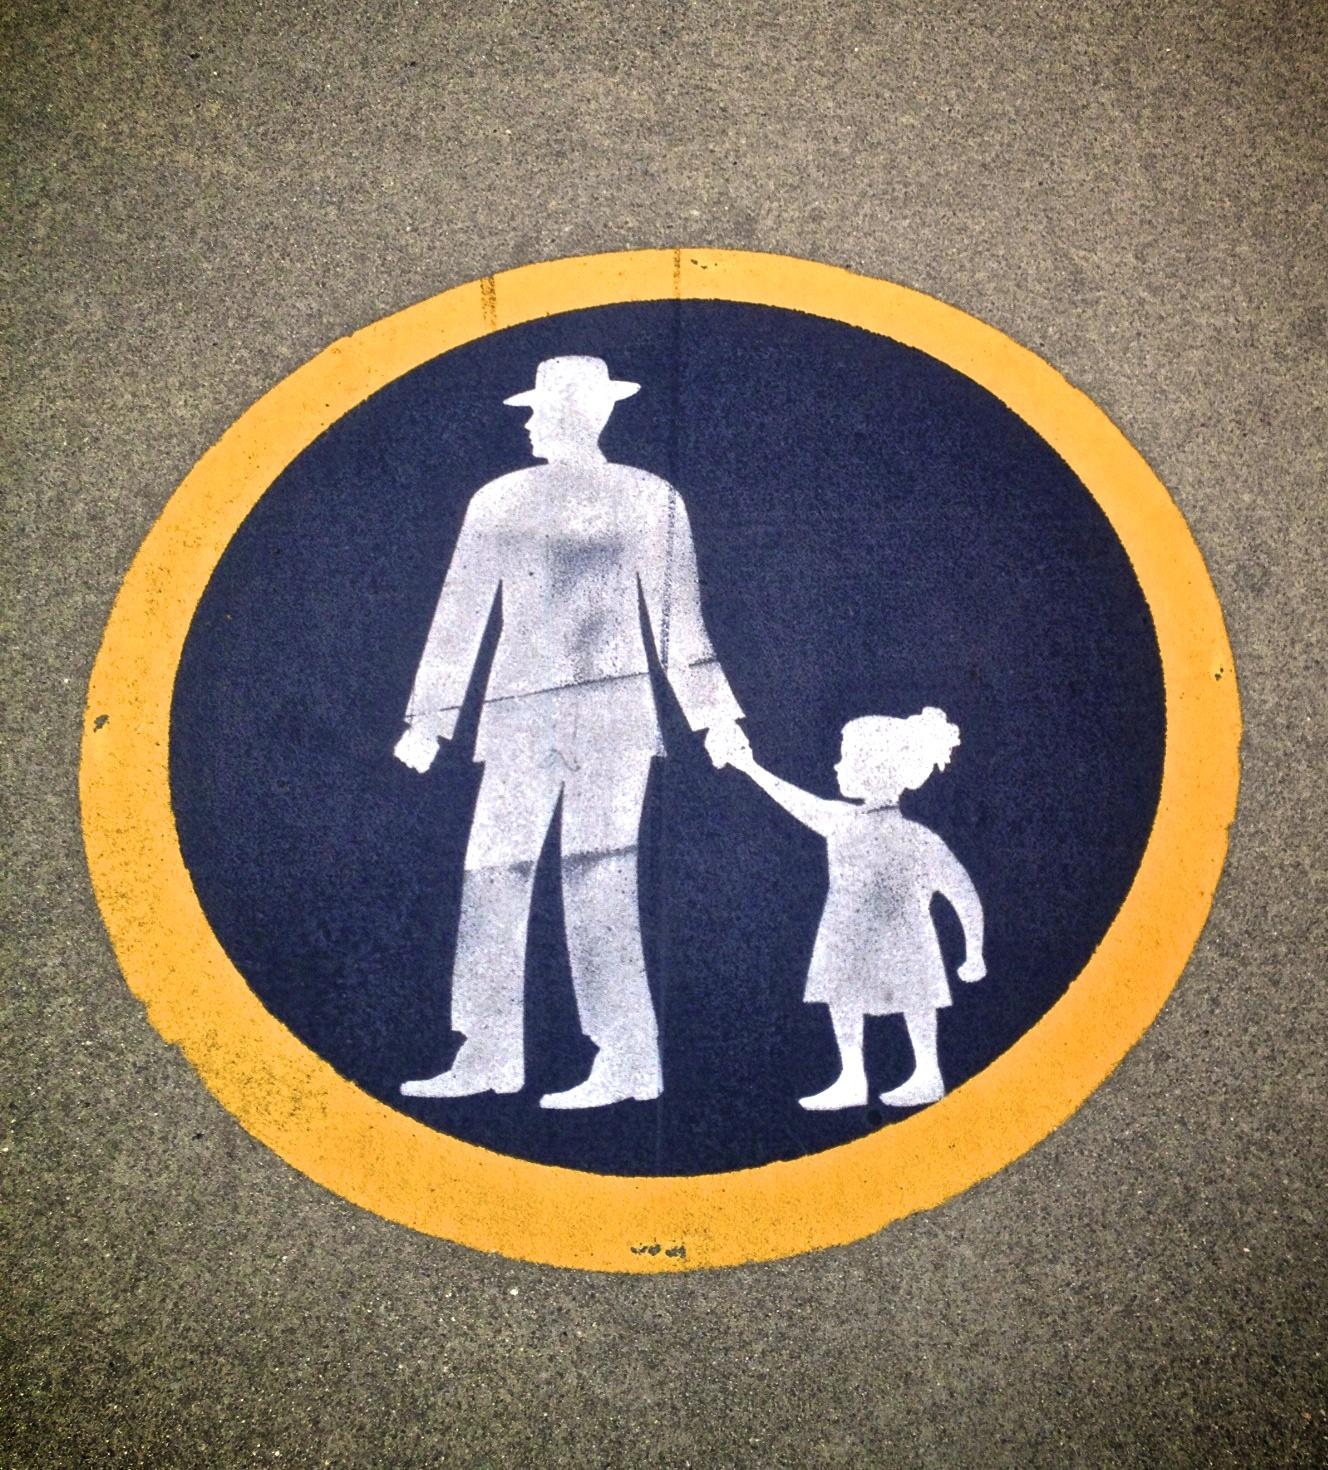 A rather bizarre icon to represent pedestrians.